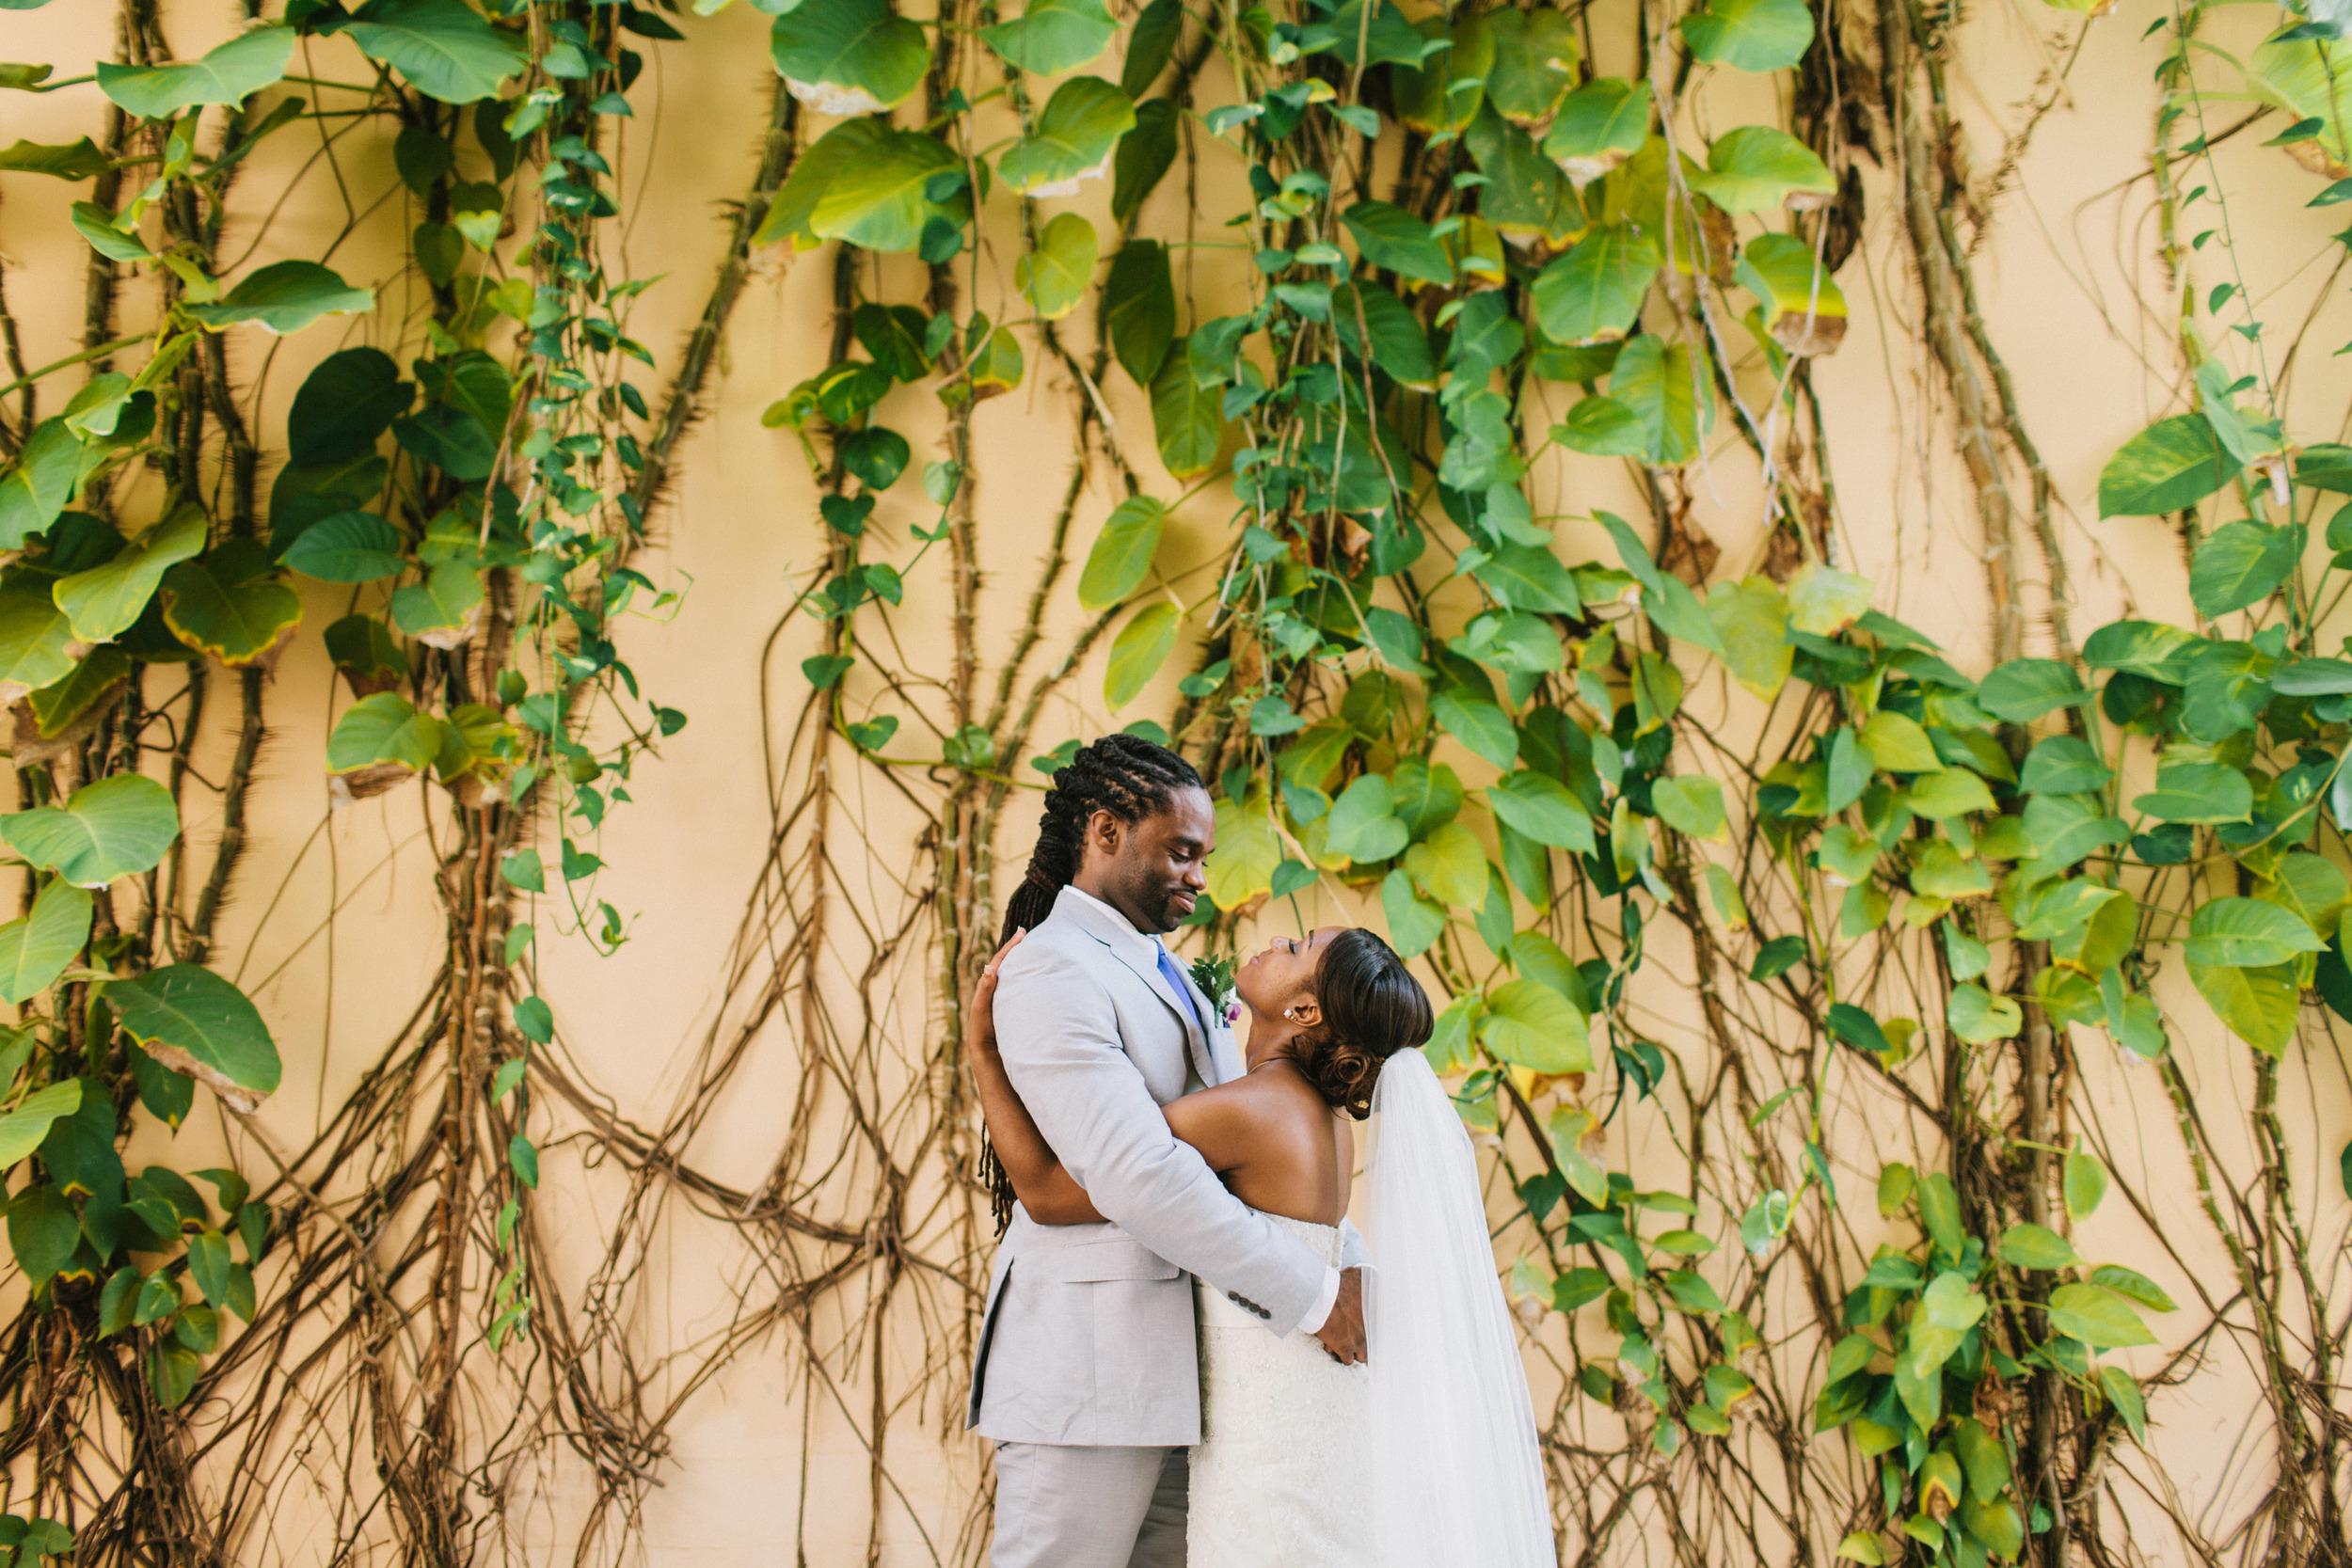 michael-rousseau-photography-dominican-republic-destination-wedding-cara-jason-colonial-majestic-dominican-republic092.jpg